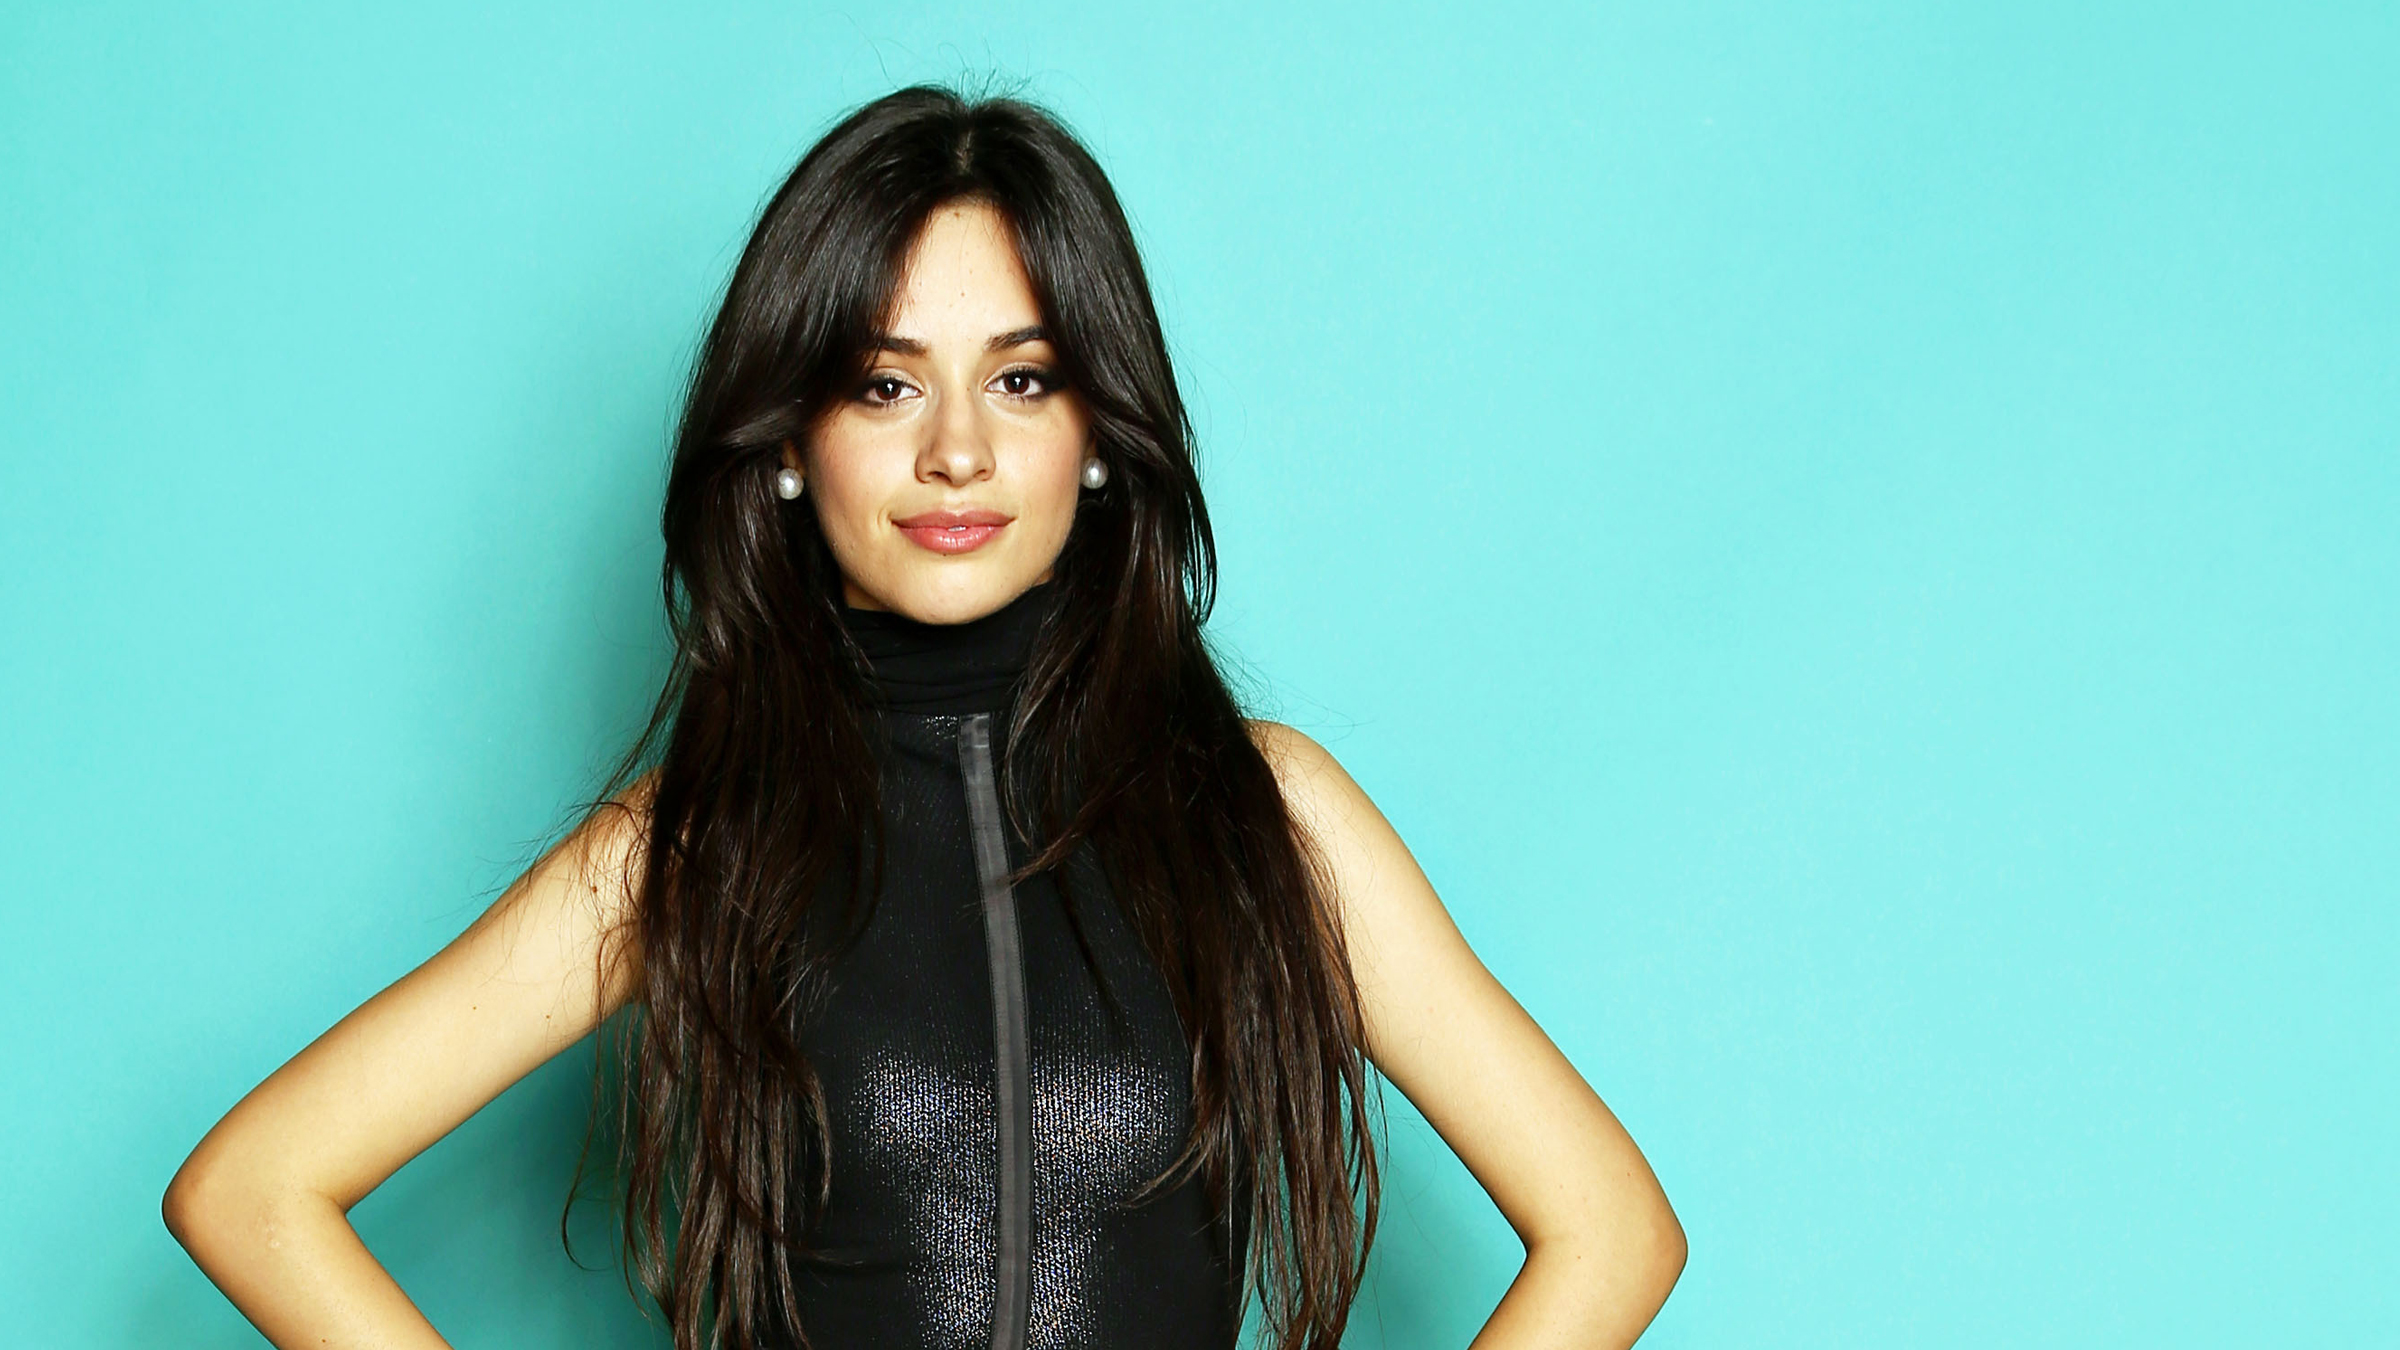 Camila angst teaser